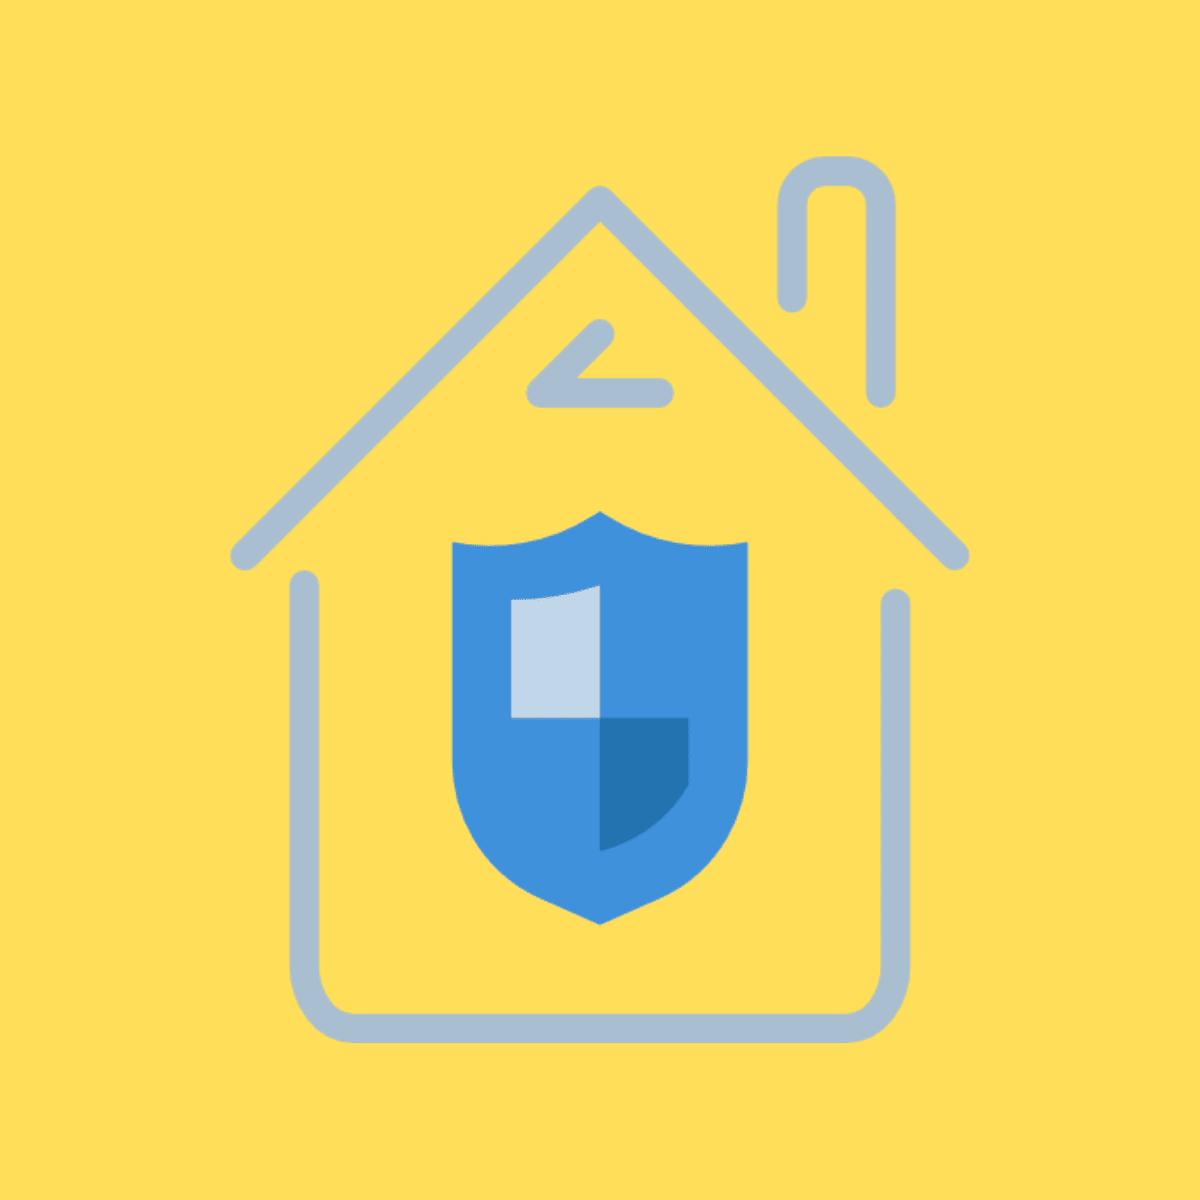 Mortgage Default Insurance (CMHC Insurance)